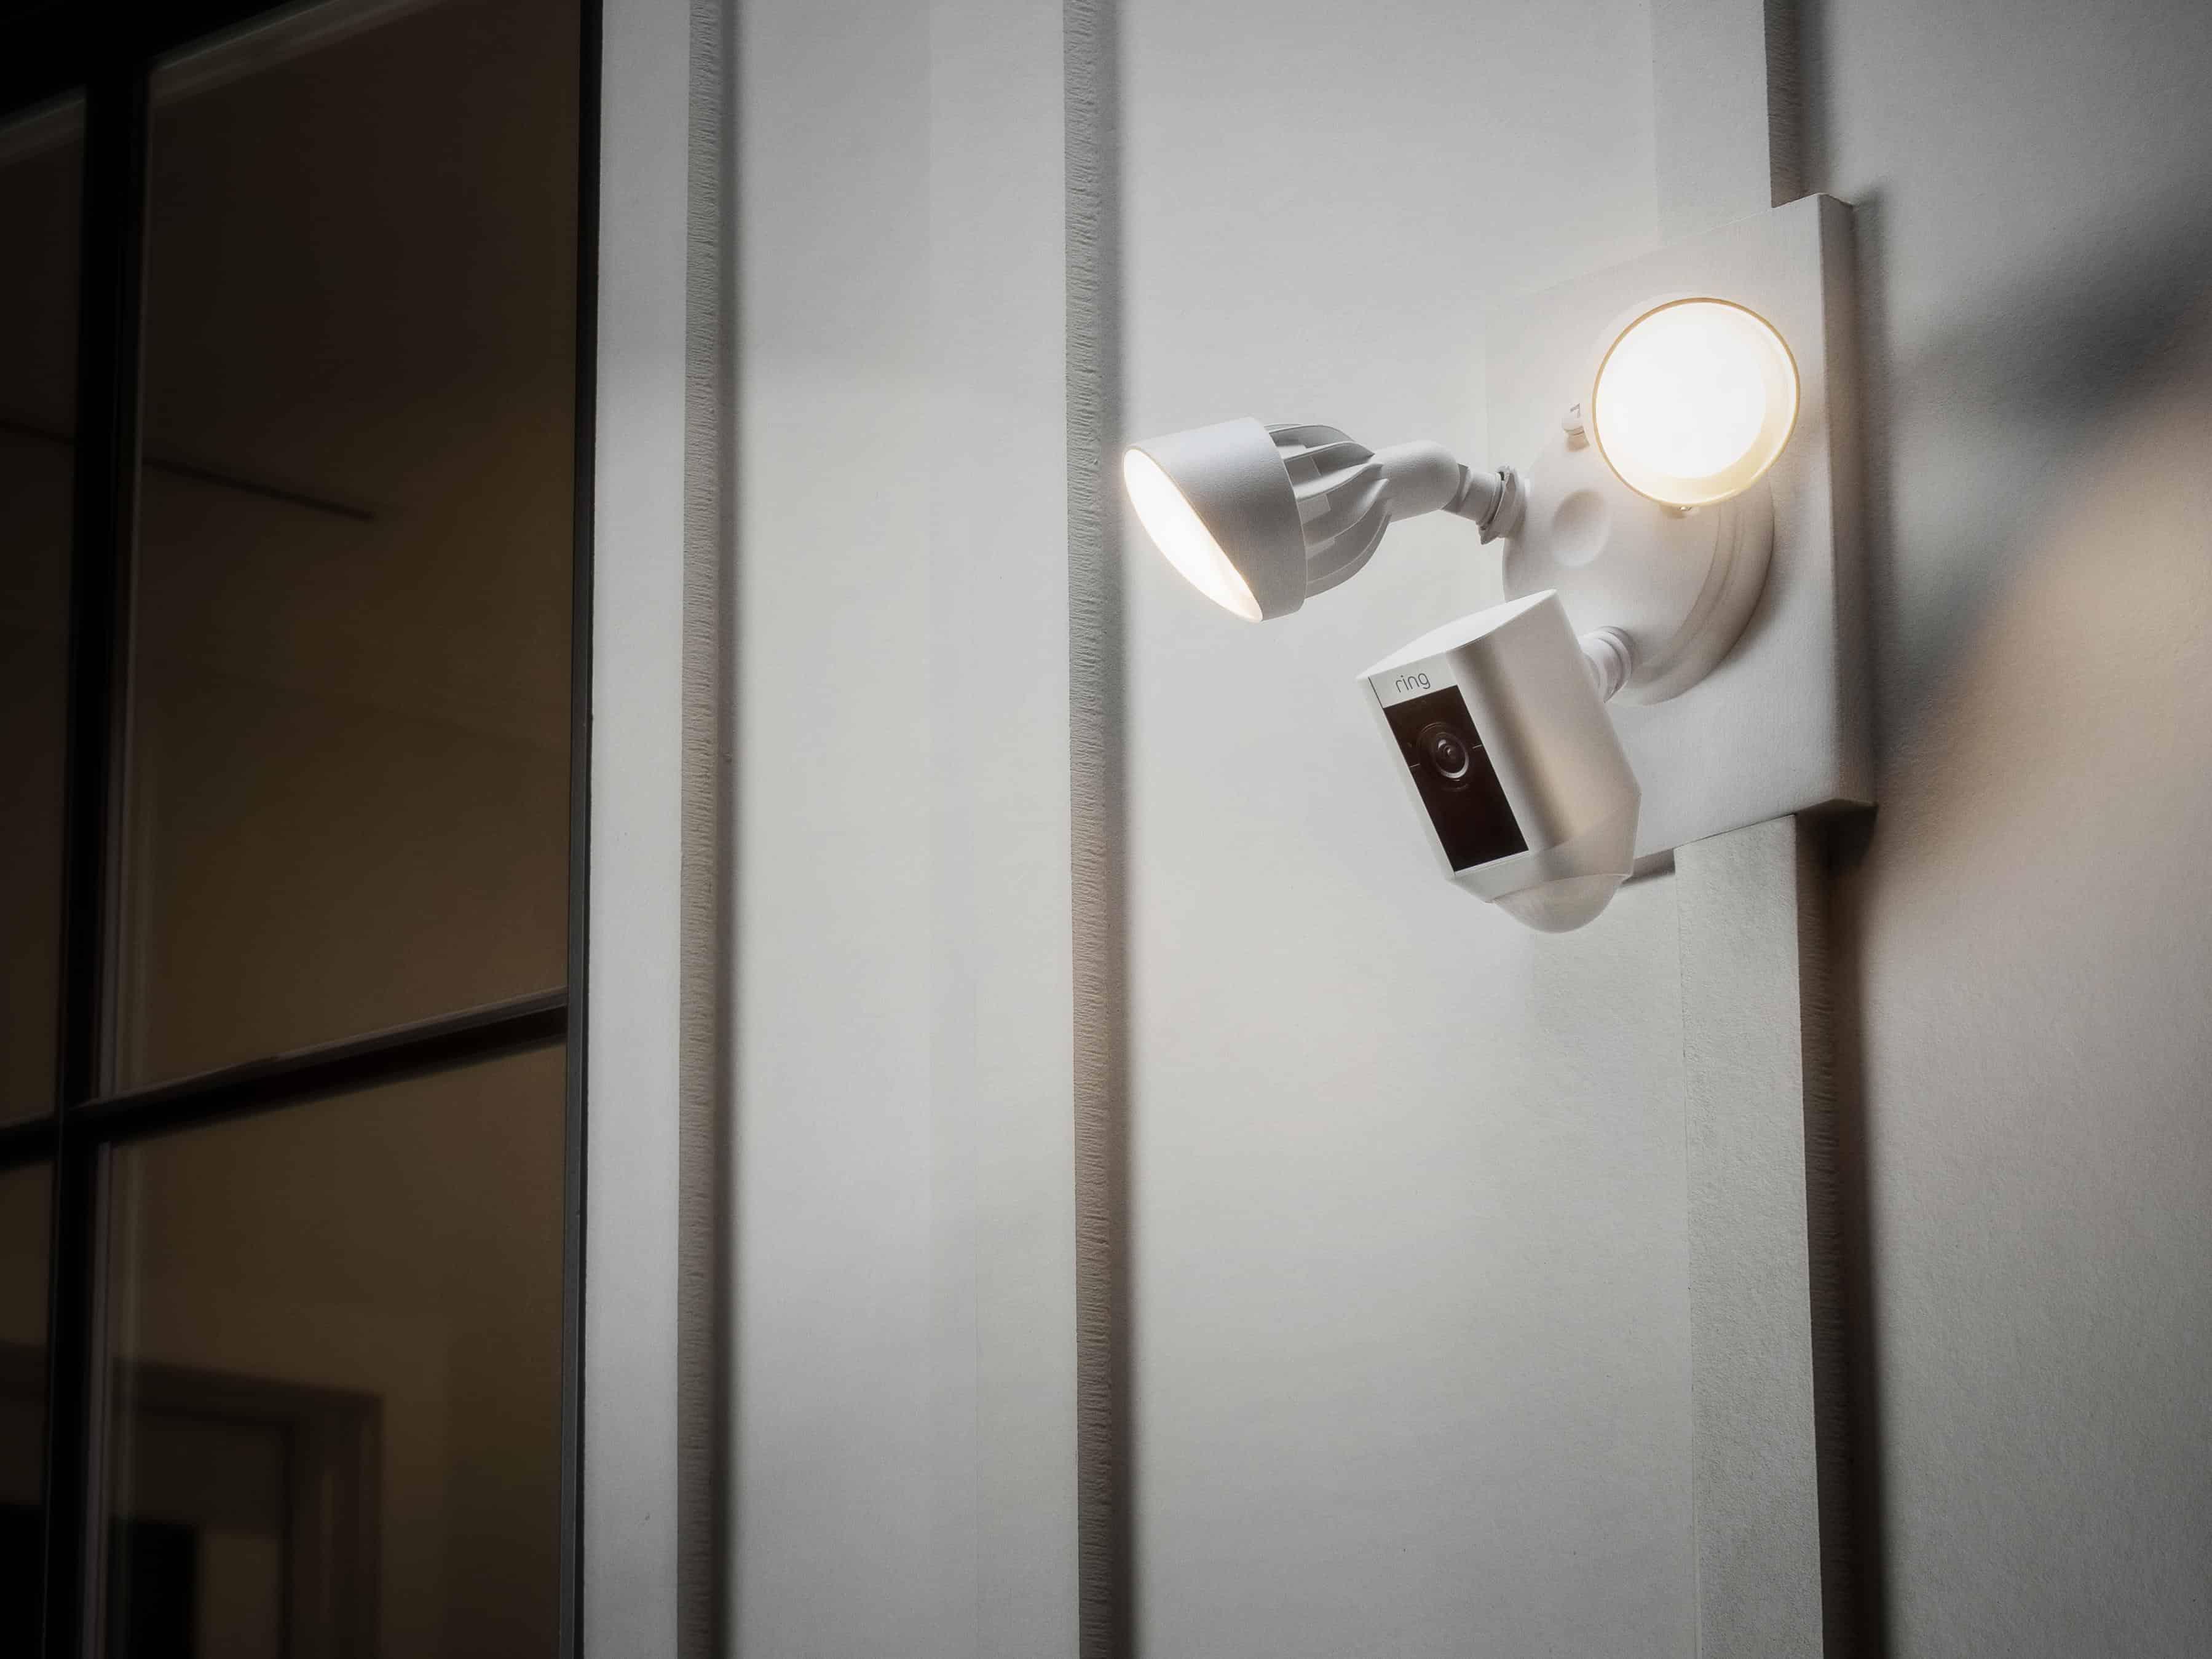 Ring Floodlight Cam 4